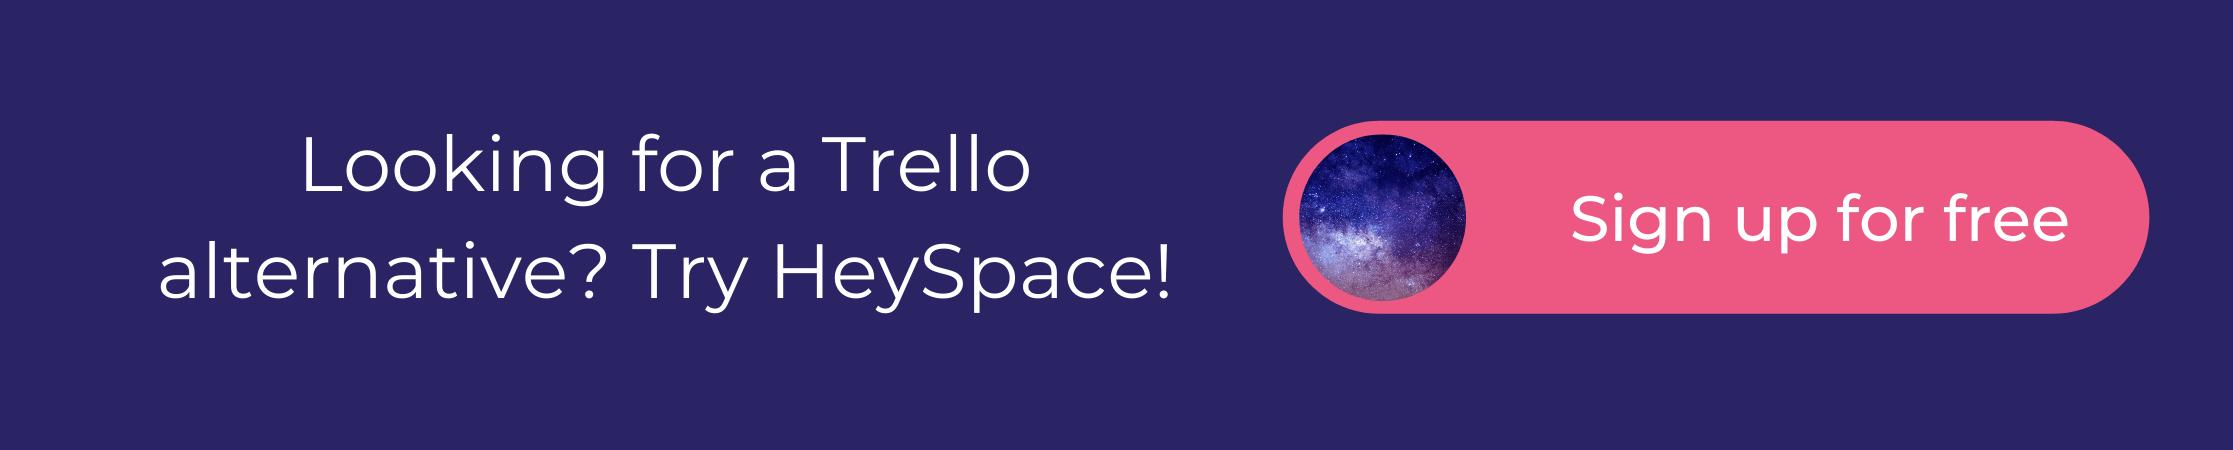 HeySpace - Trello alternative